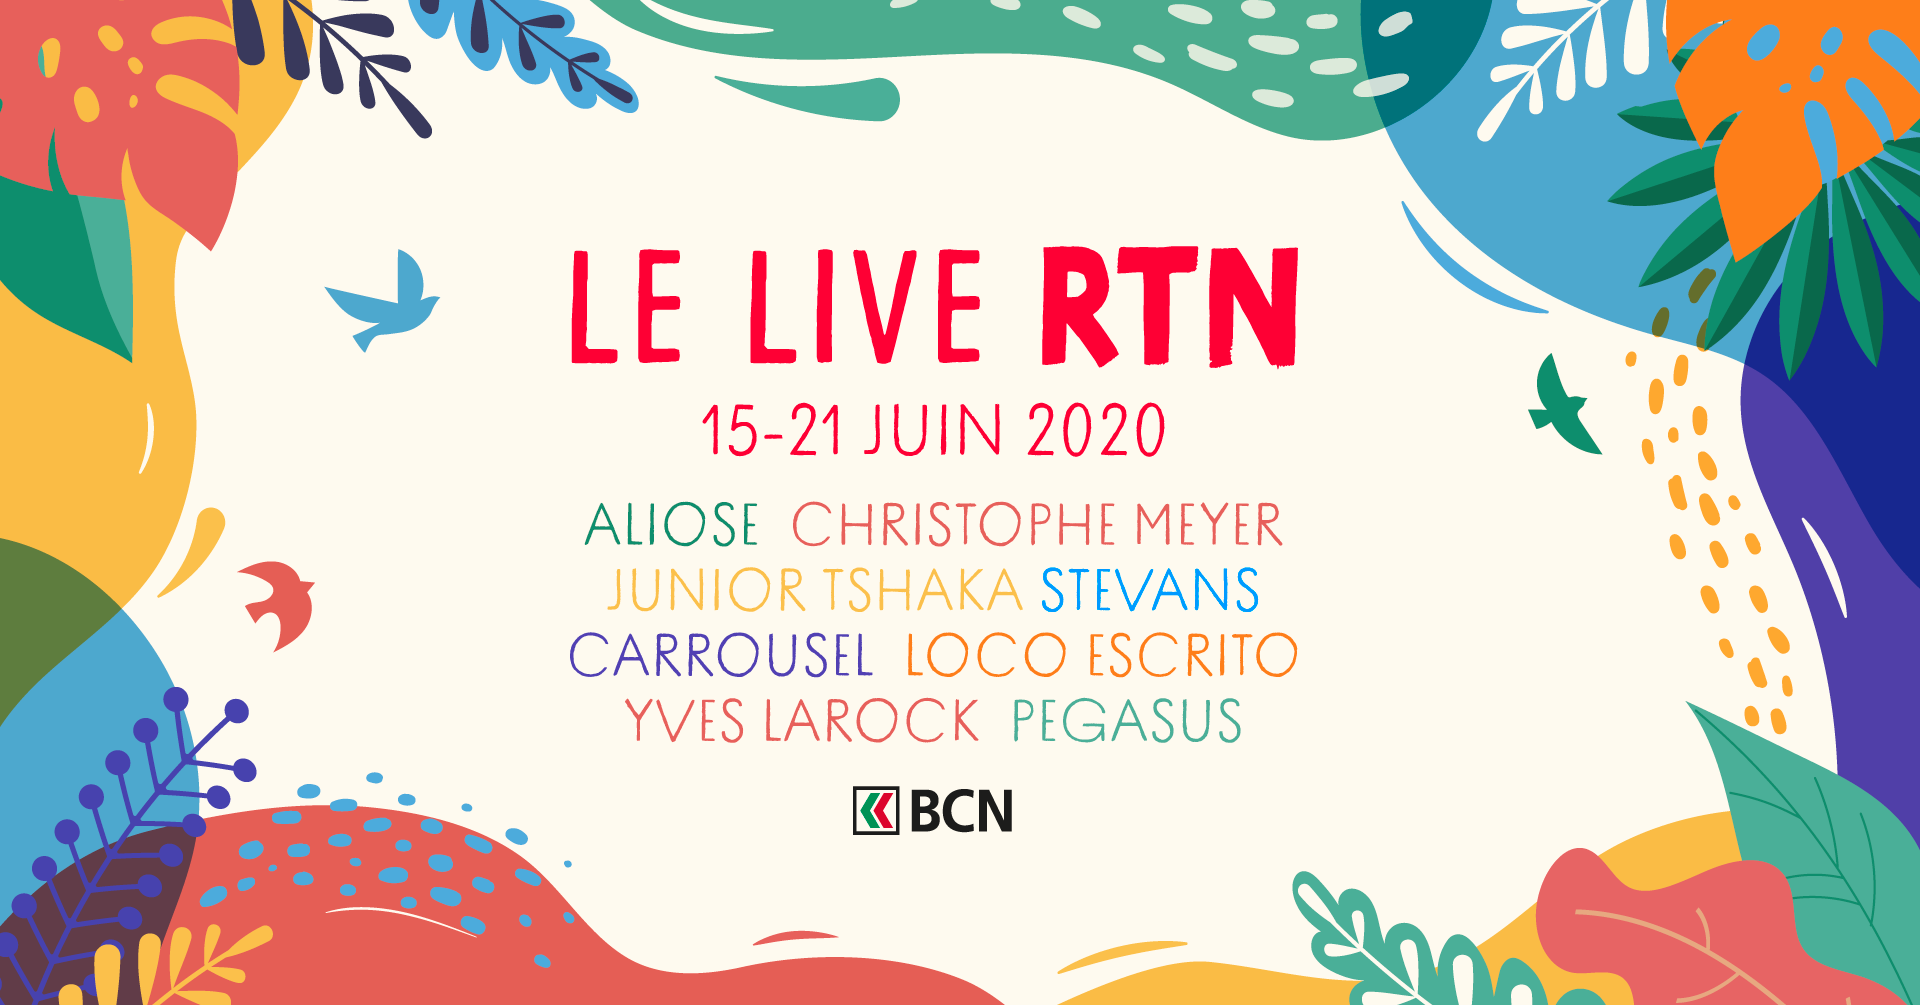 Les radios RJB, RTN et RFJ lancent leur festival